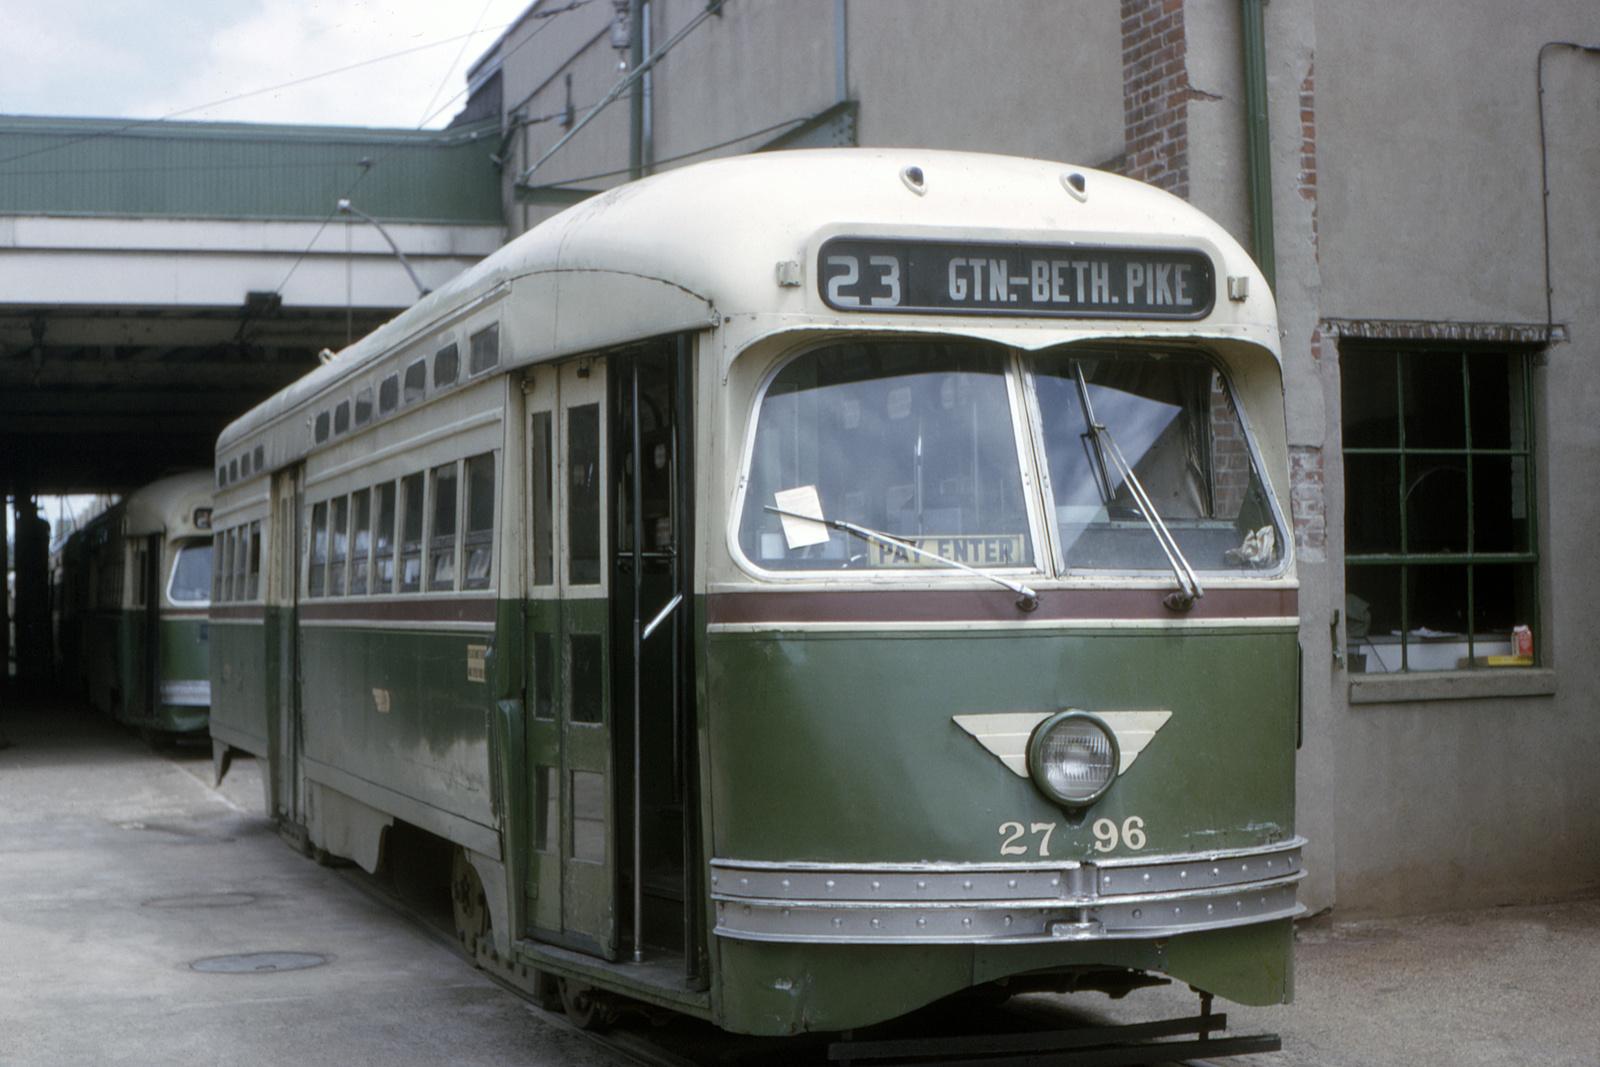 (575k, 1600x1067)<br><b>Country:</b> United States<br><b>City:</b> Philadelphia, PA<br><b>System:</b> SEPTA (or Predecessor)<br><b>Line:</b> Rt. 23-Germantown<br><b>Location:</b> Germantown Depot<br><b>Car:</b> PTC/SEPTA Postwar All-electric PCC (St.Louis, 1947) 2796 <br><b>Collection of:</b> David Pirmann<br><b>Date:</b> 5/1964<br><b>Viewed (this week/total):</b> 1 / 51